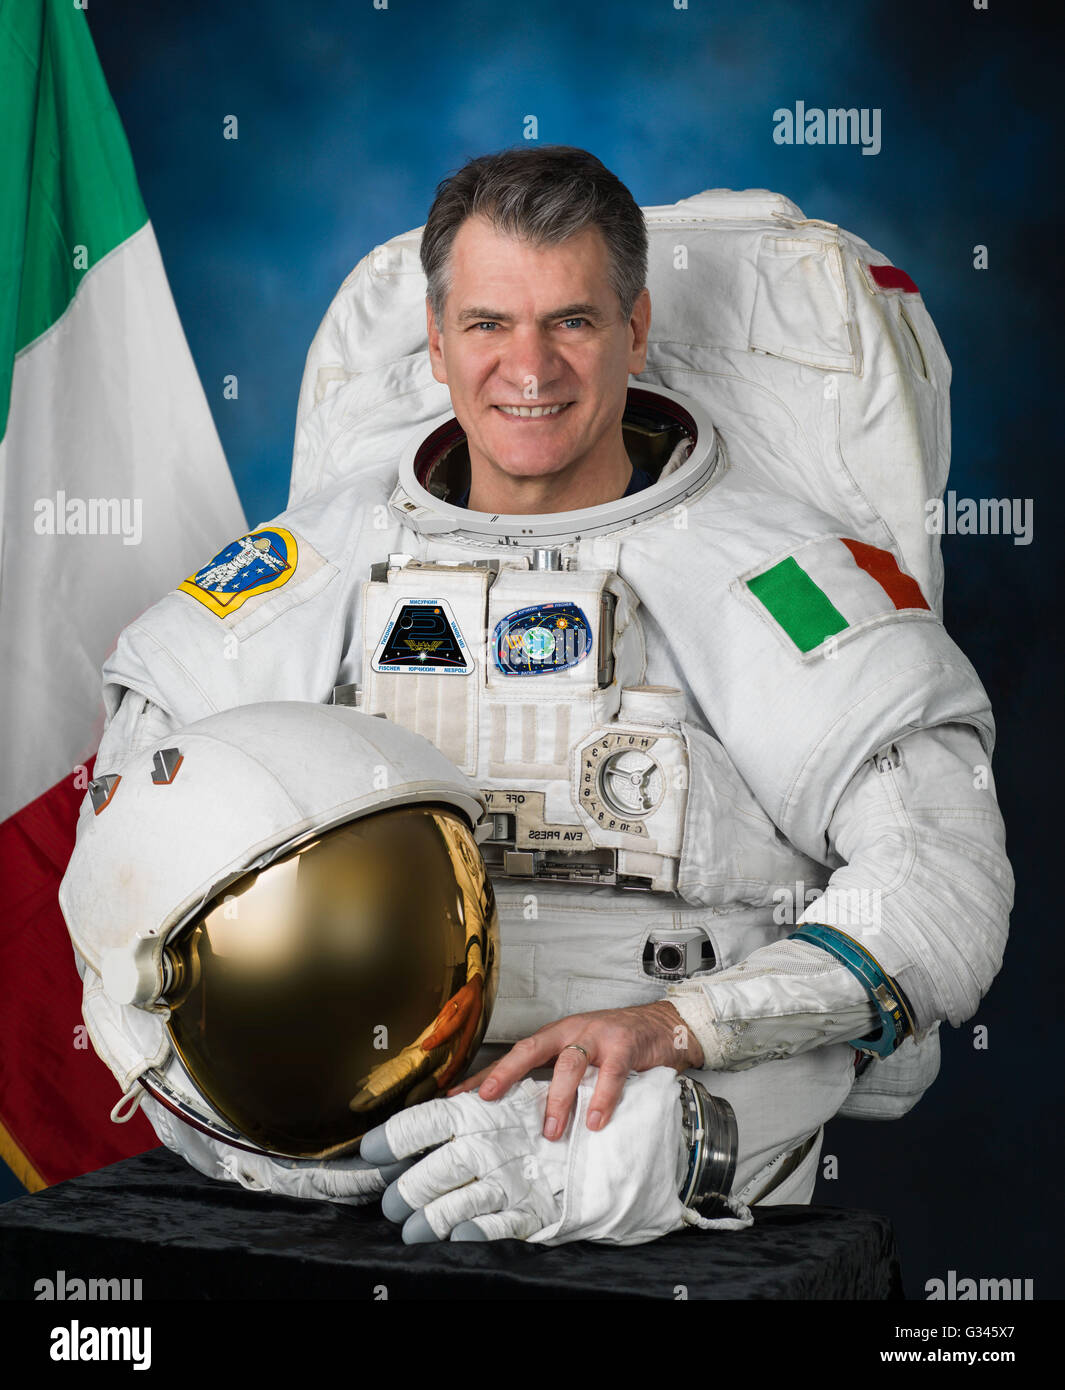 european space agency astronaut jobs - photo #10